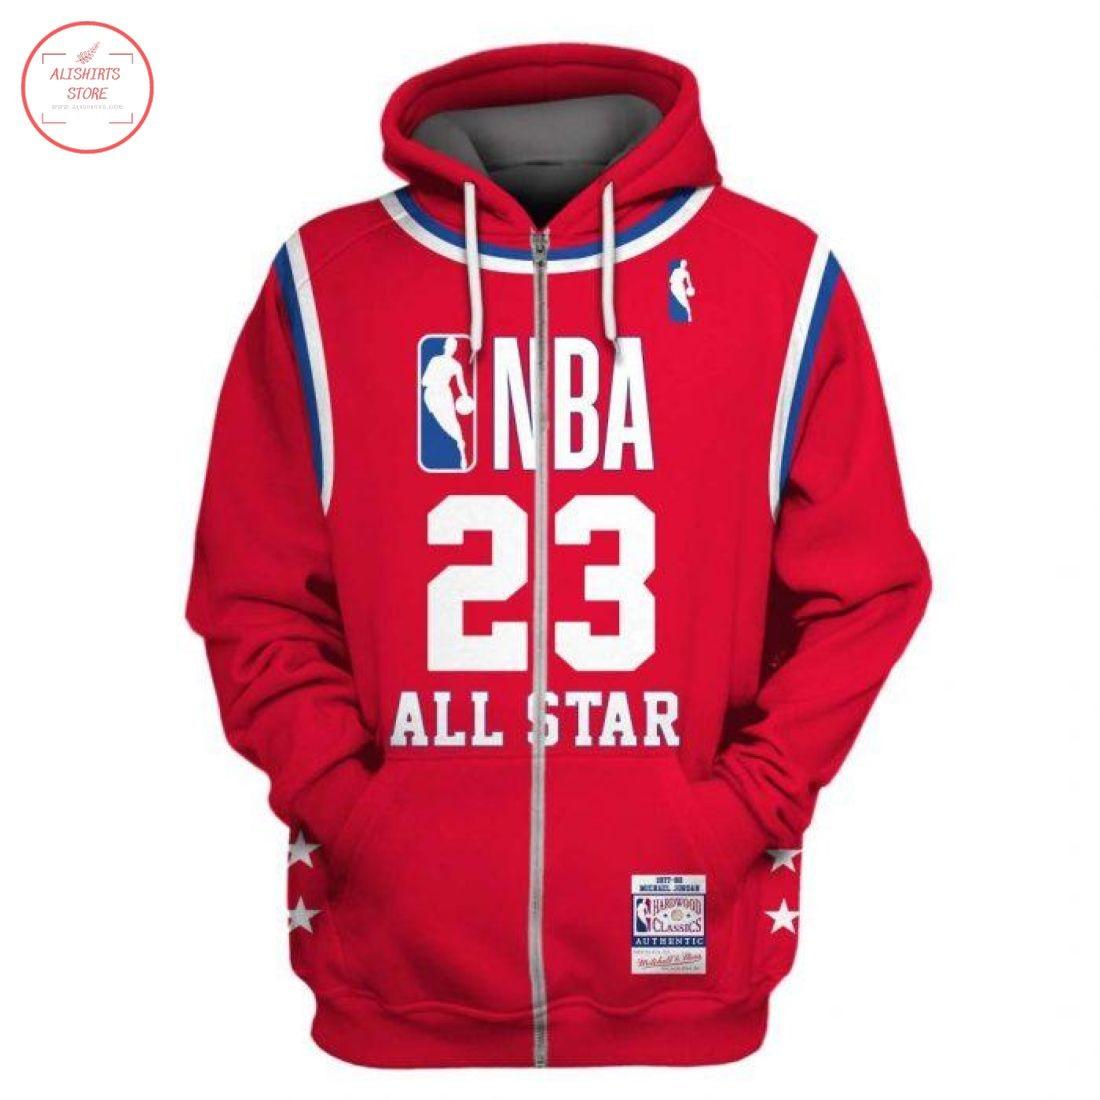 Michael Jordan 23 All Star NBA Zip Hoodie